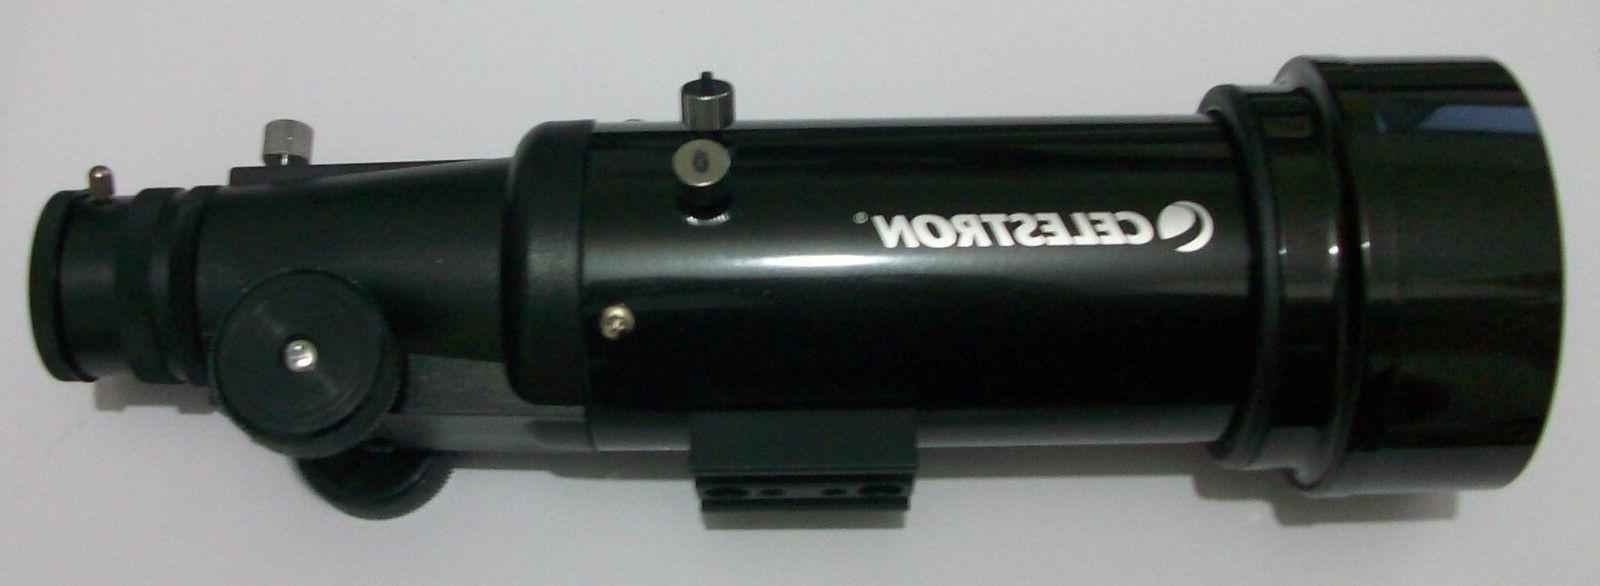 70mm rich field refractor ota short